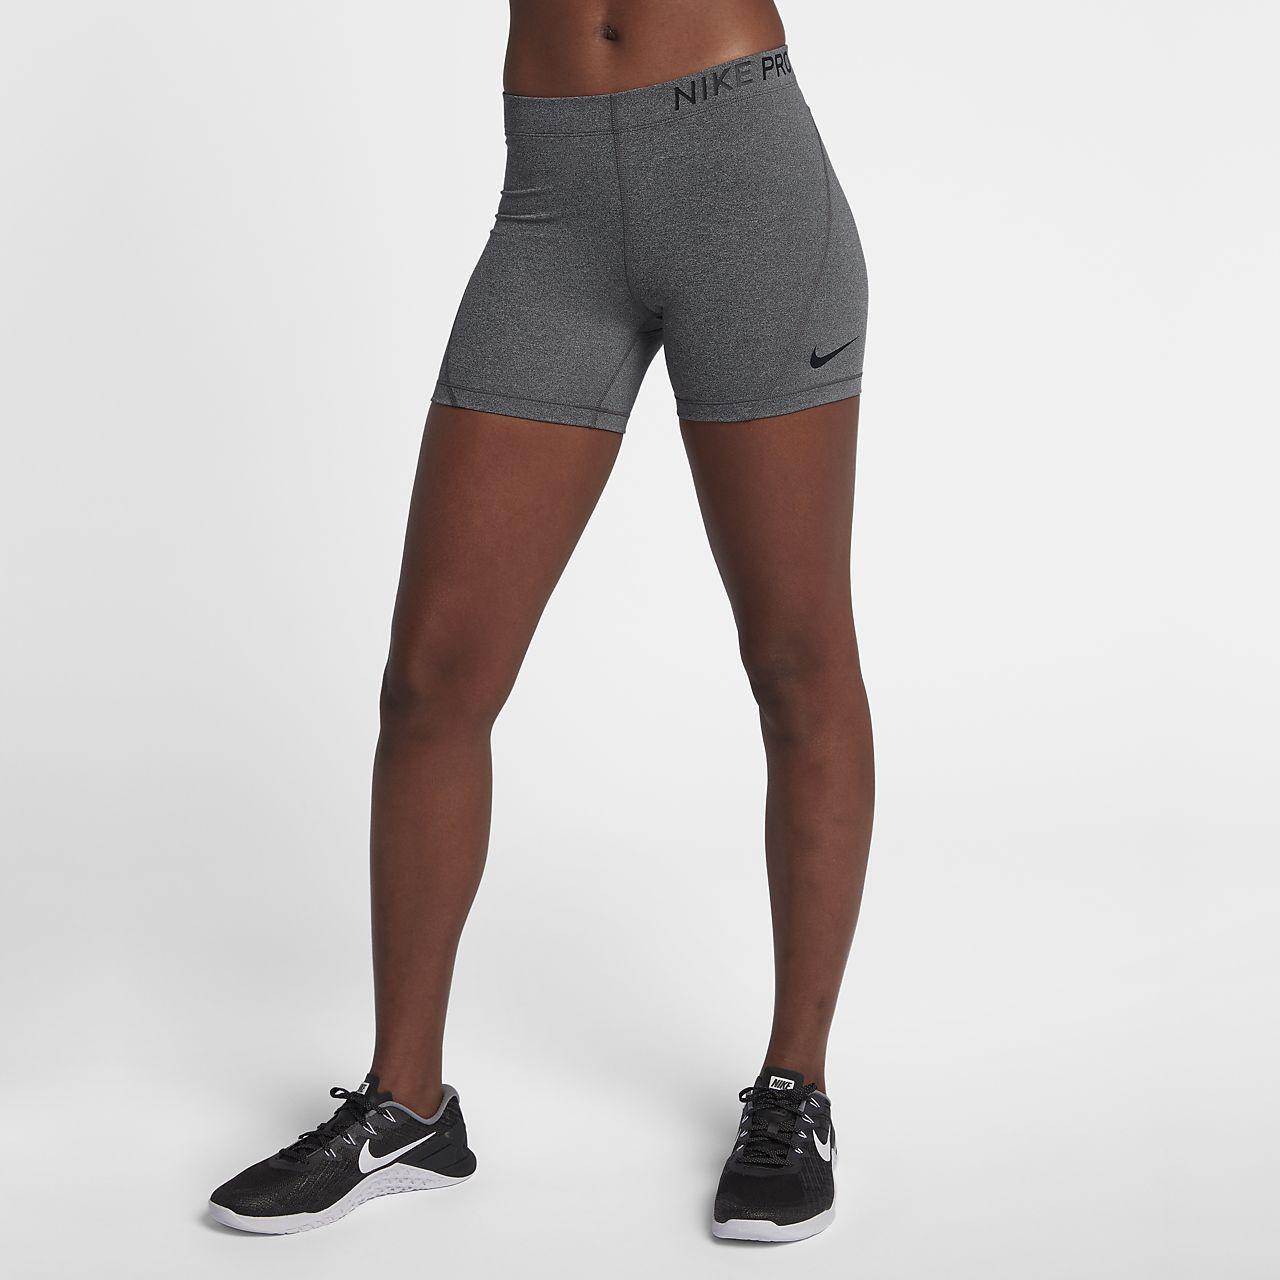 Nike shorts women Tips to Consider While Selecting Shorts